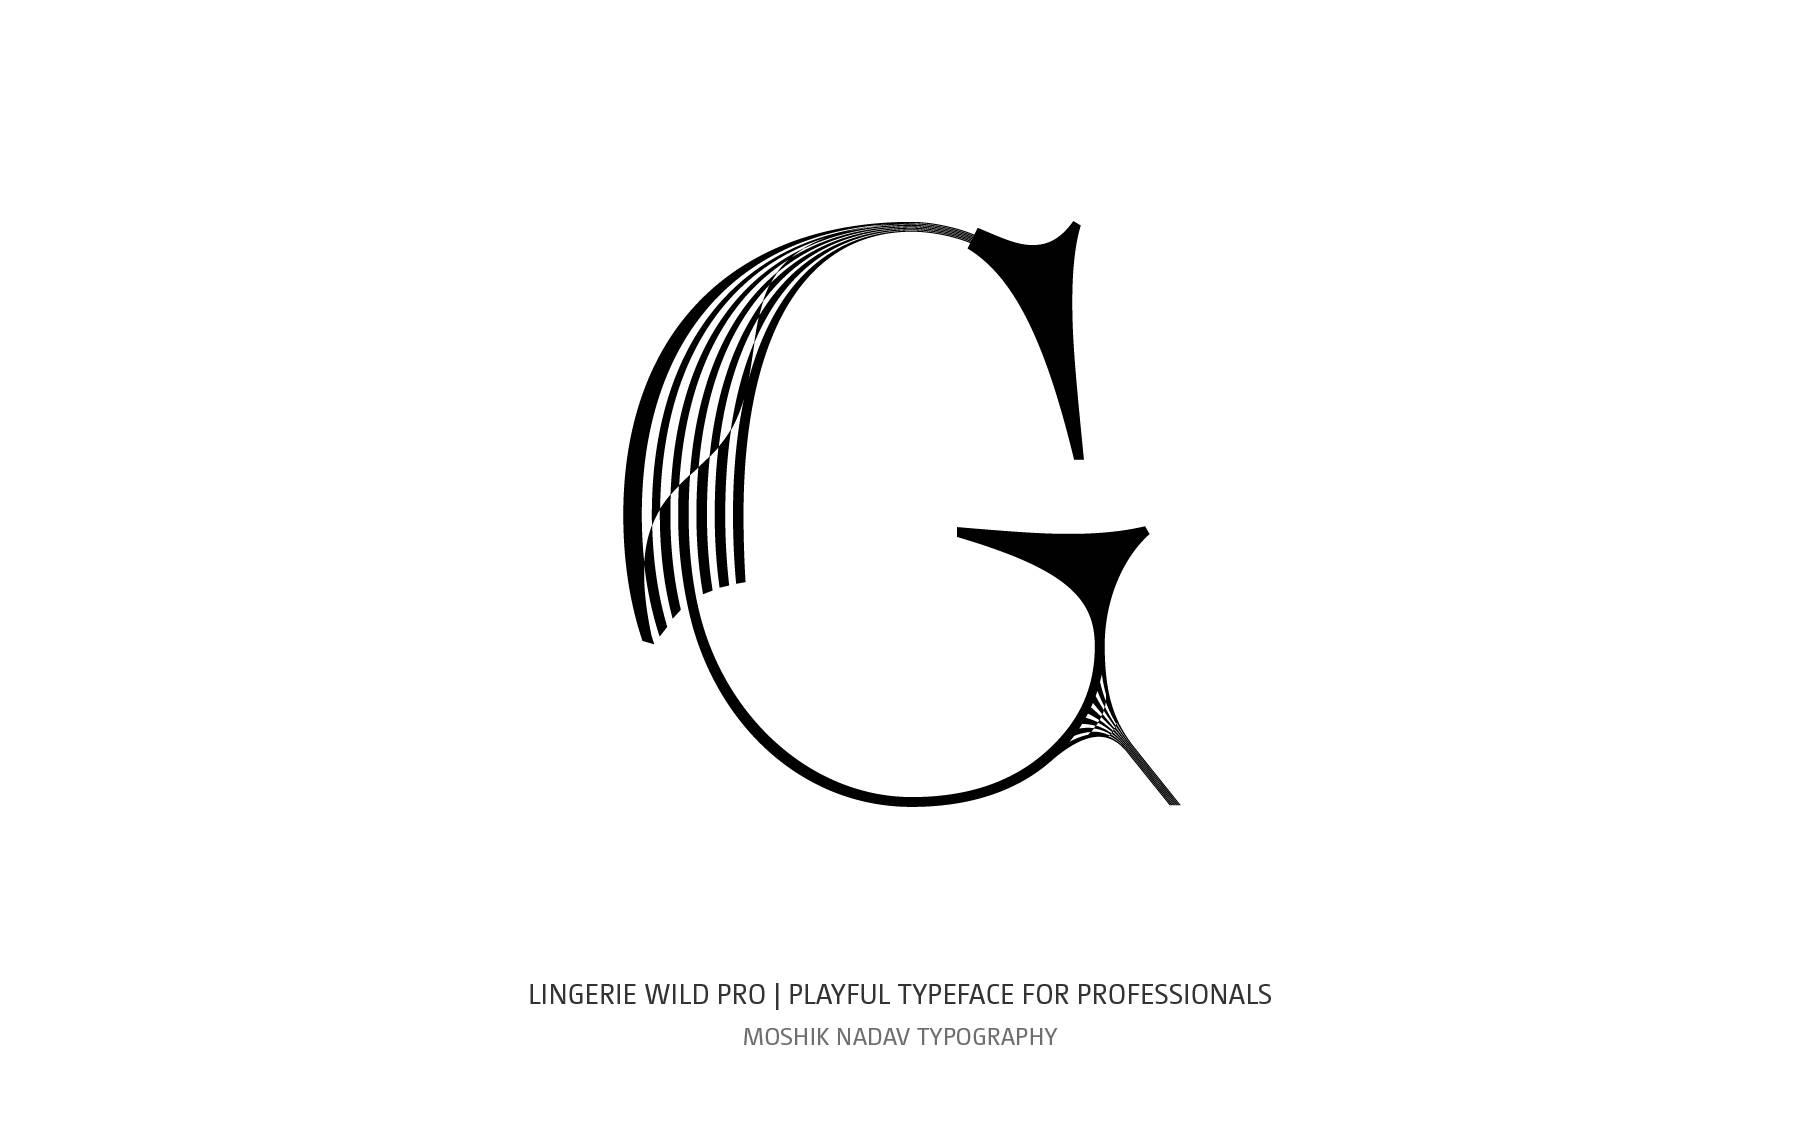 Lingerie Wild Pro Typeface uppercase G designed by Moshik Nadav custom type design NYC